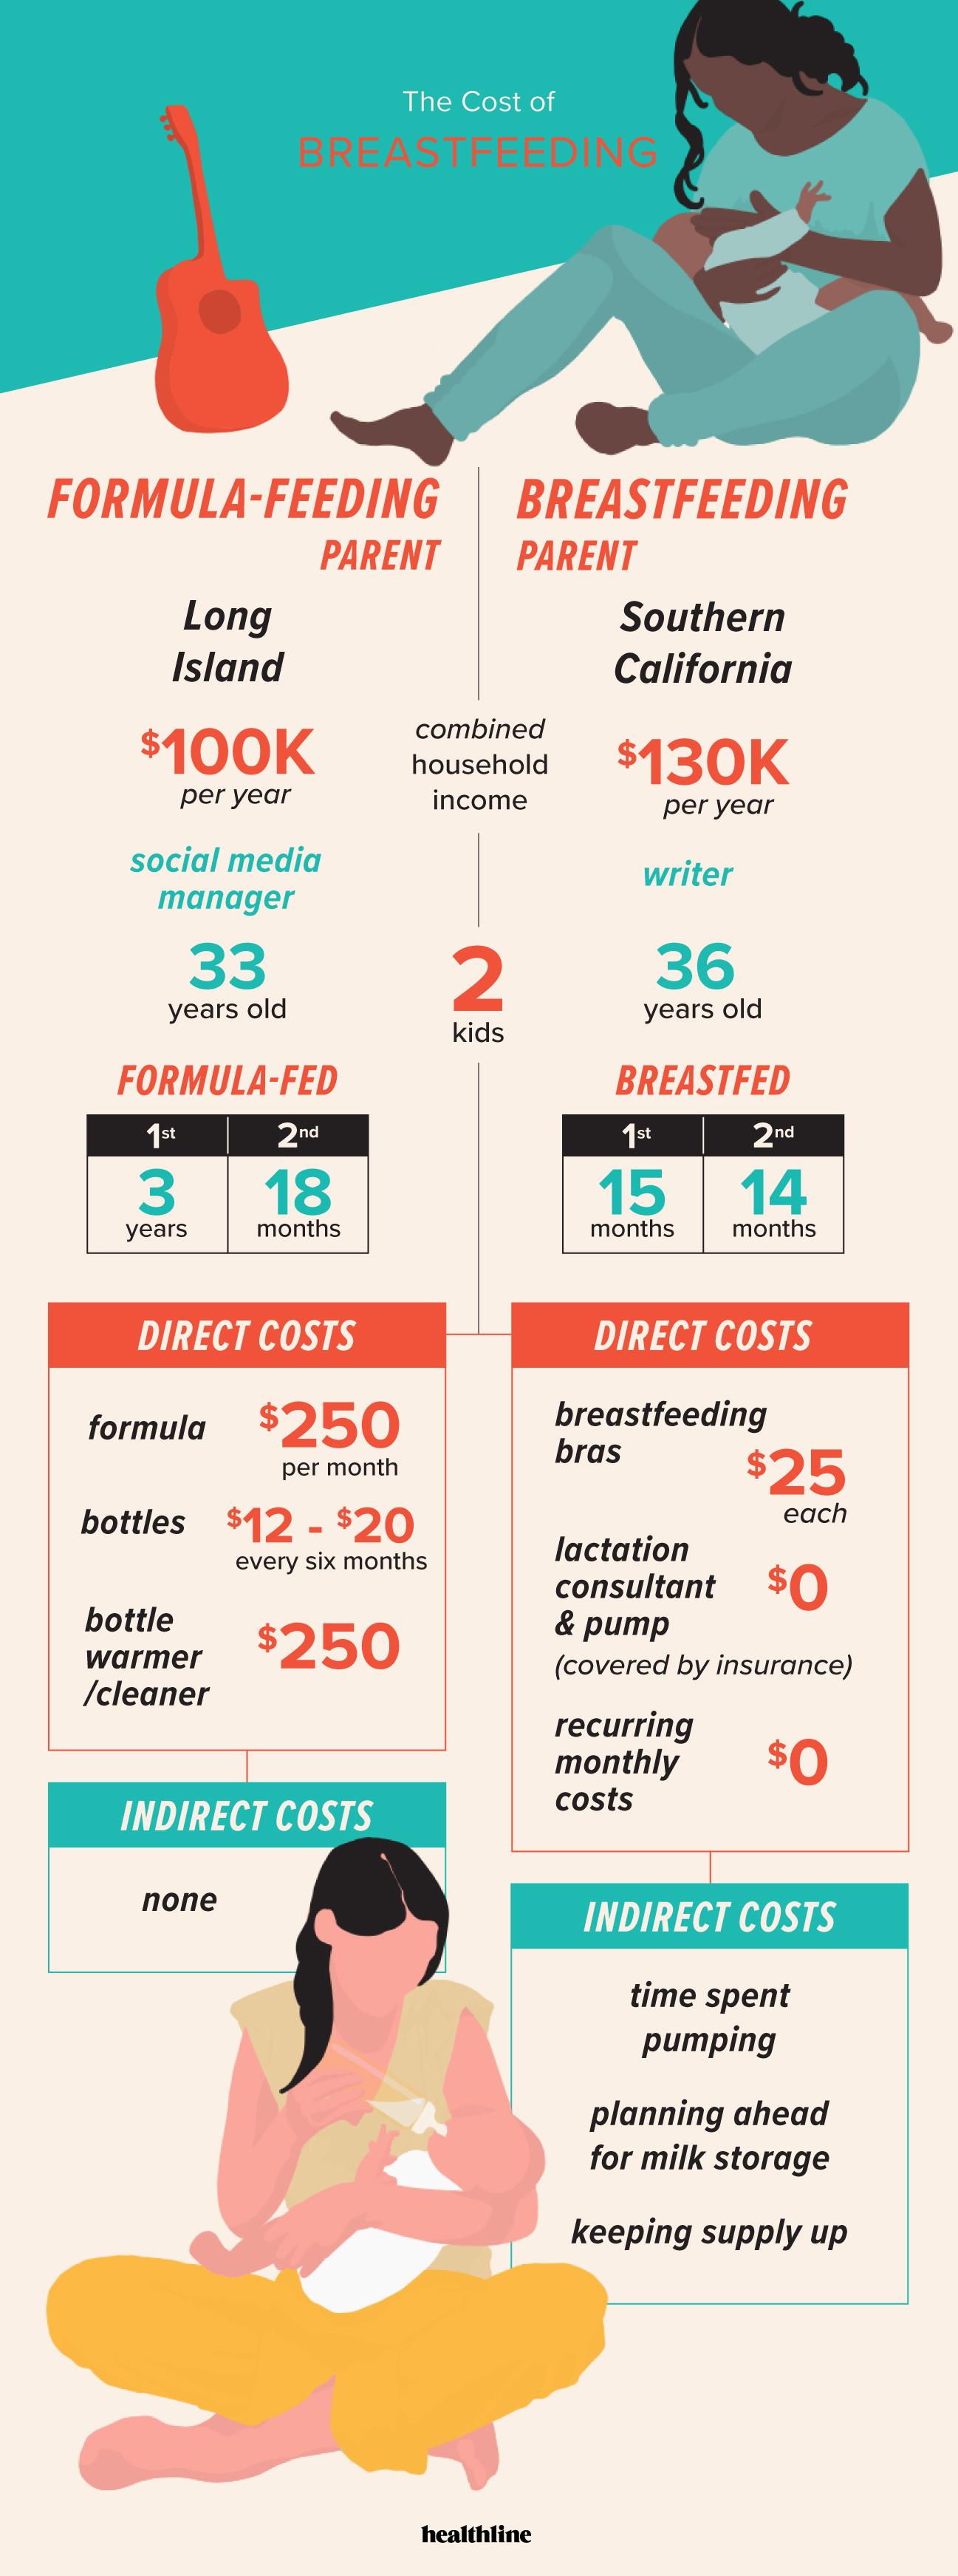 7894e6b8f Breakdown of the Cost of Breastfeeding